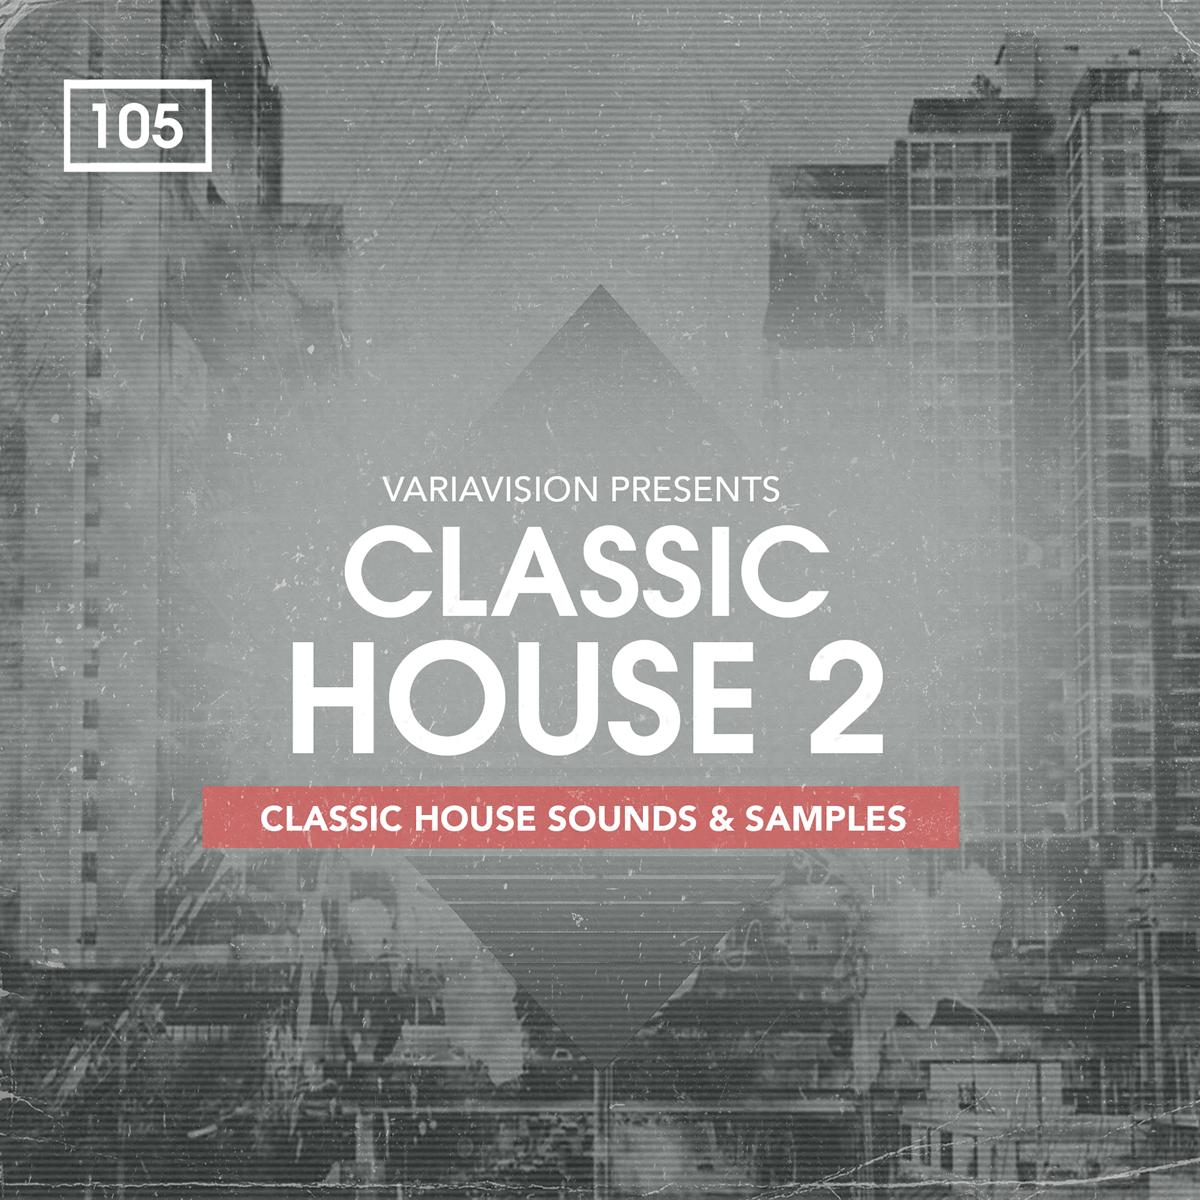 BINGOSHAKERZからクラシカルなハウス向けのサンプル・パック『VARIAVISION PRESENTS CLASSIC HOUSE 2』がリリースされた